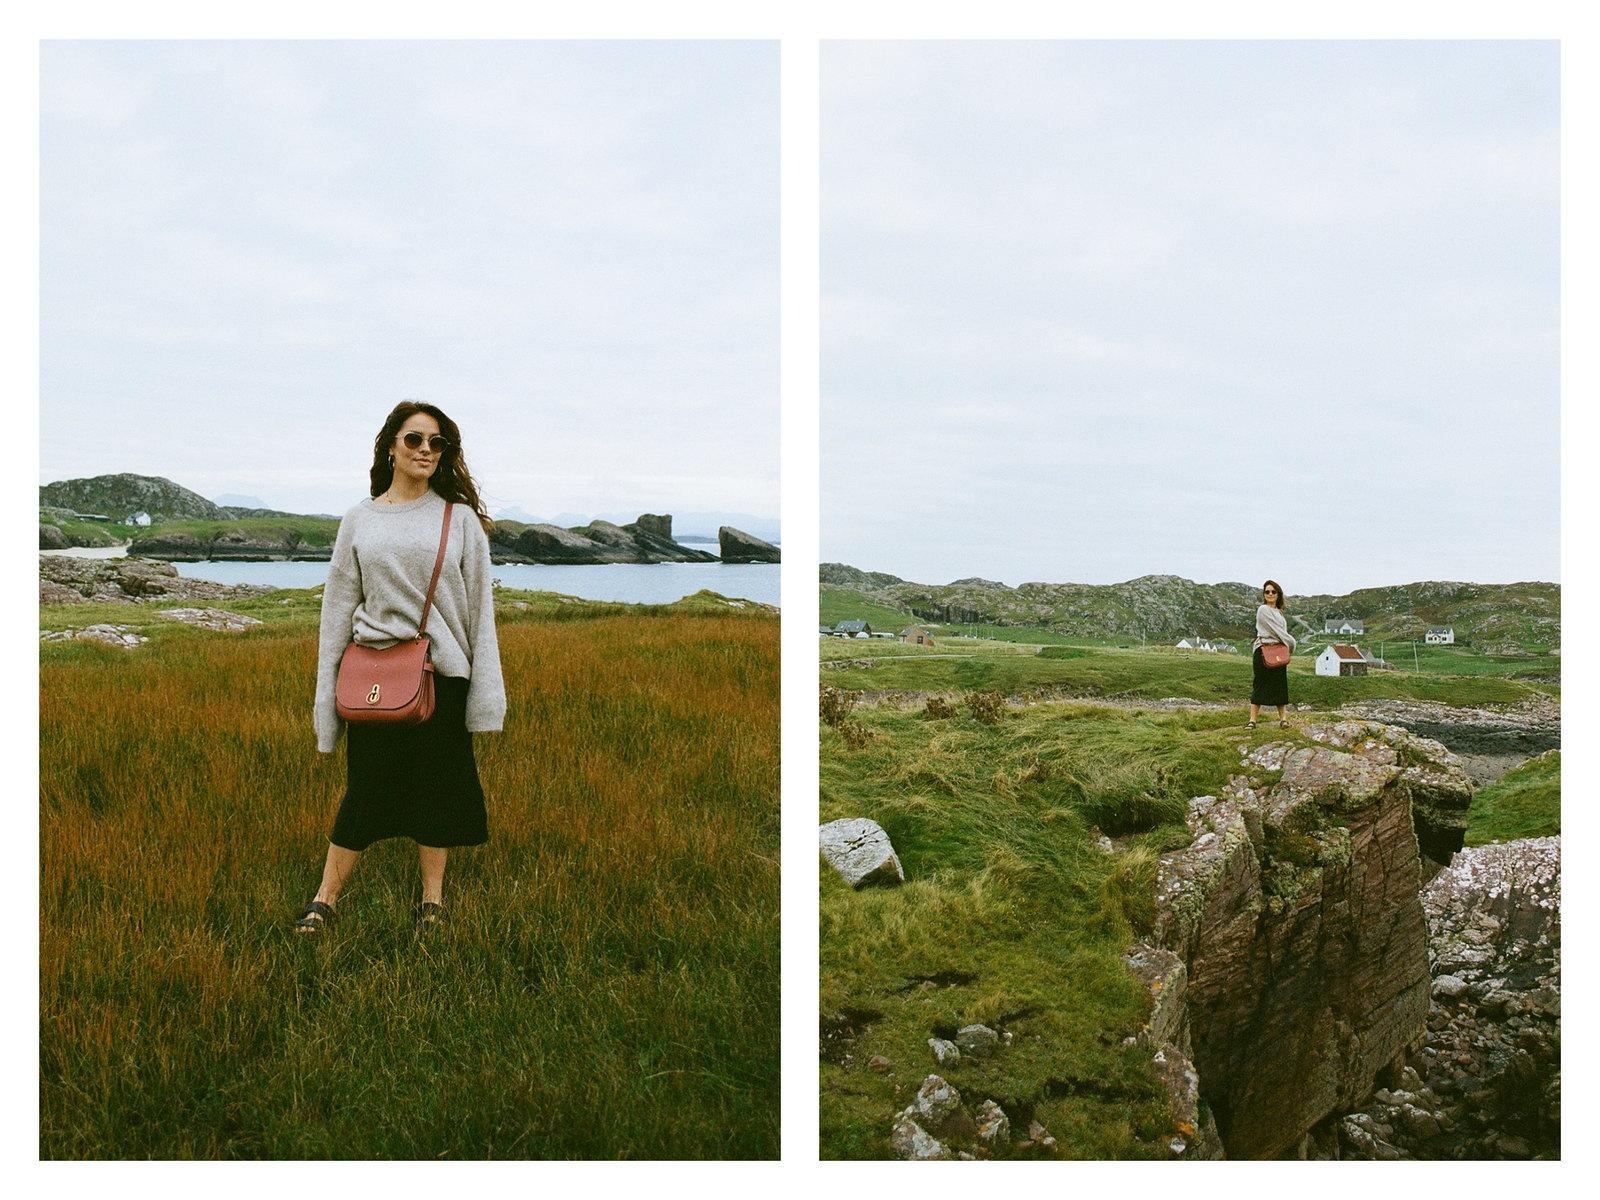 The Little Magpie Scotland Photo Diary North Coast 500 41